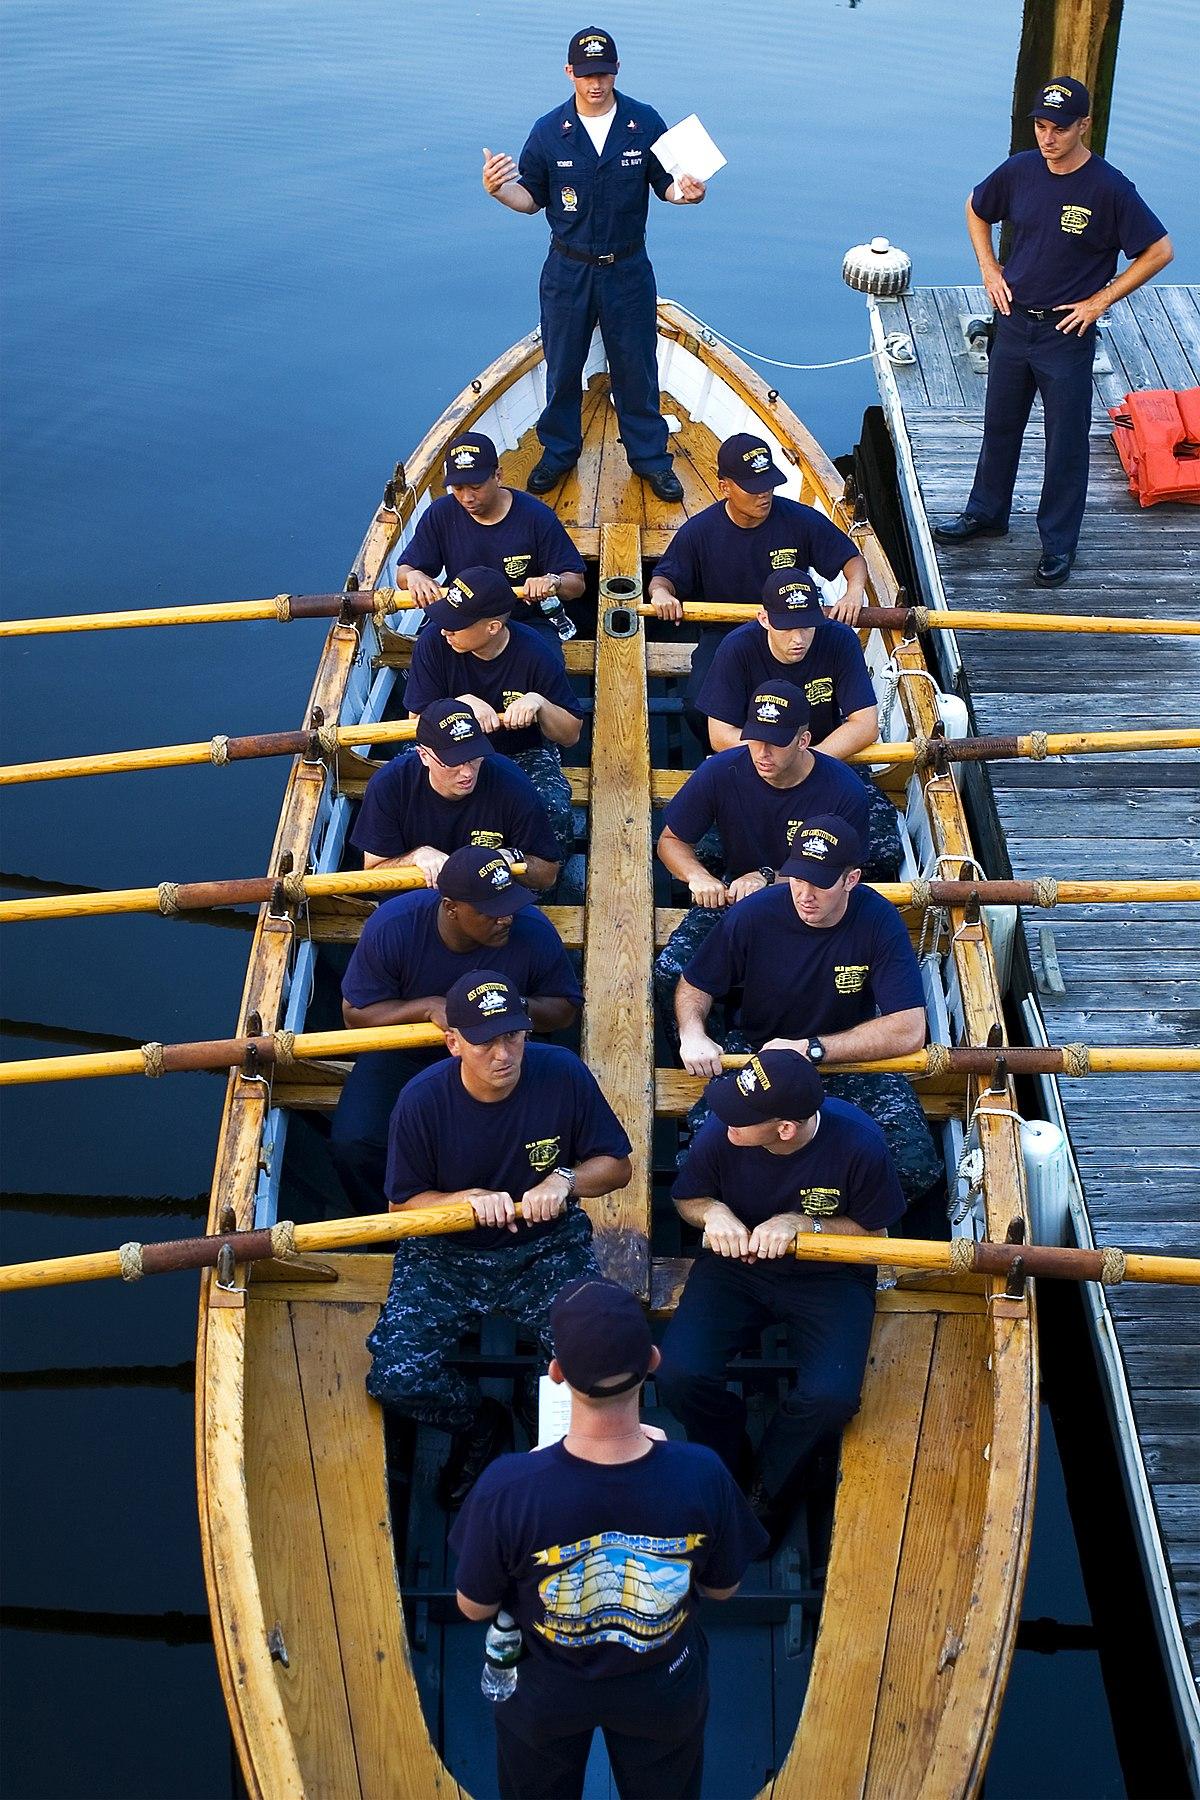 Ship's boat - Wikipedia